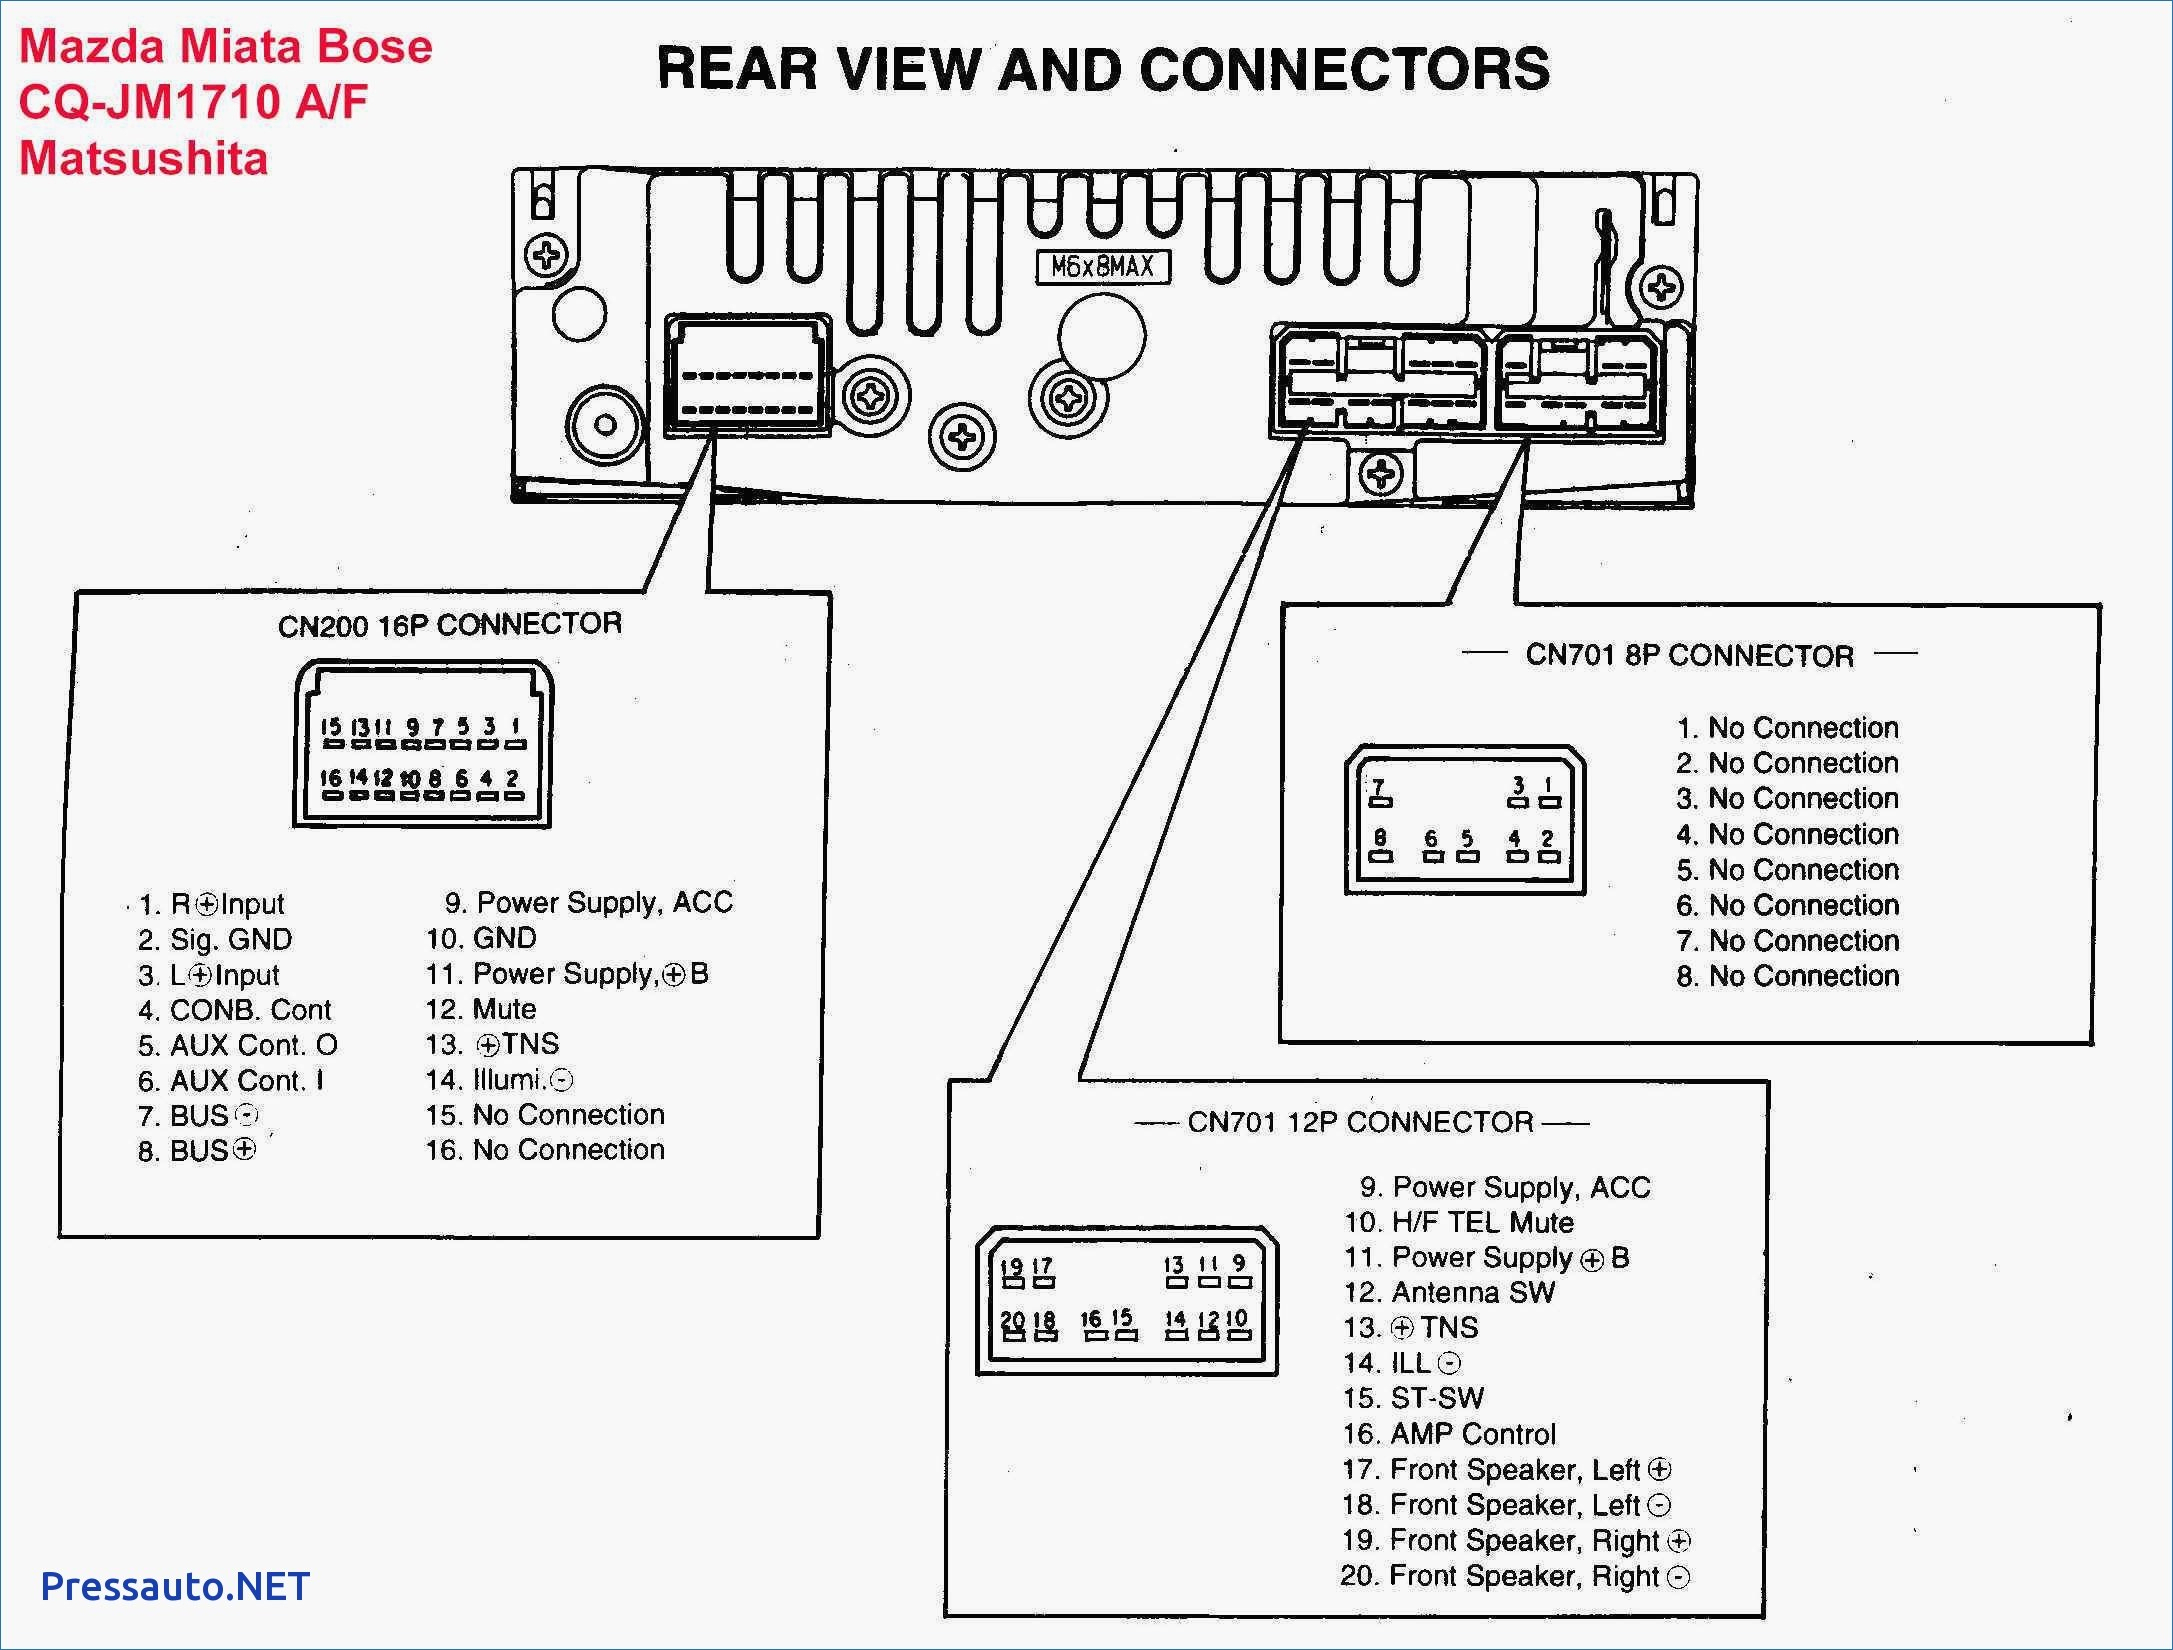 Pioneer Super Tuner 3D Wiring Diagram | Wiring Diagram - Pioneer Super Tuner 3D Wiring Diagram